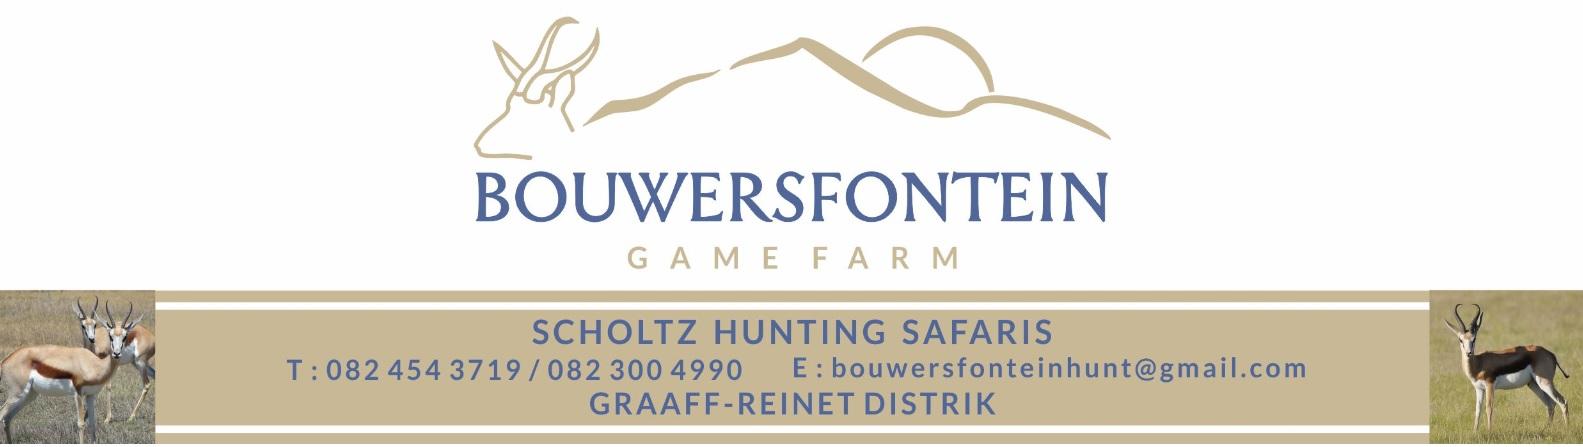 Bouersfontein Game Farm & Game Lodge